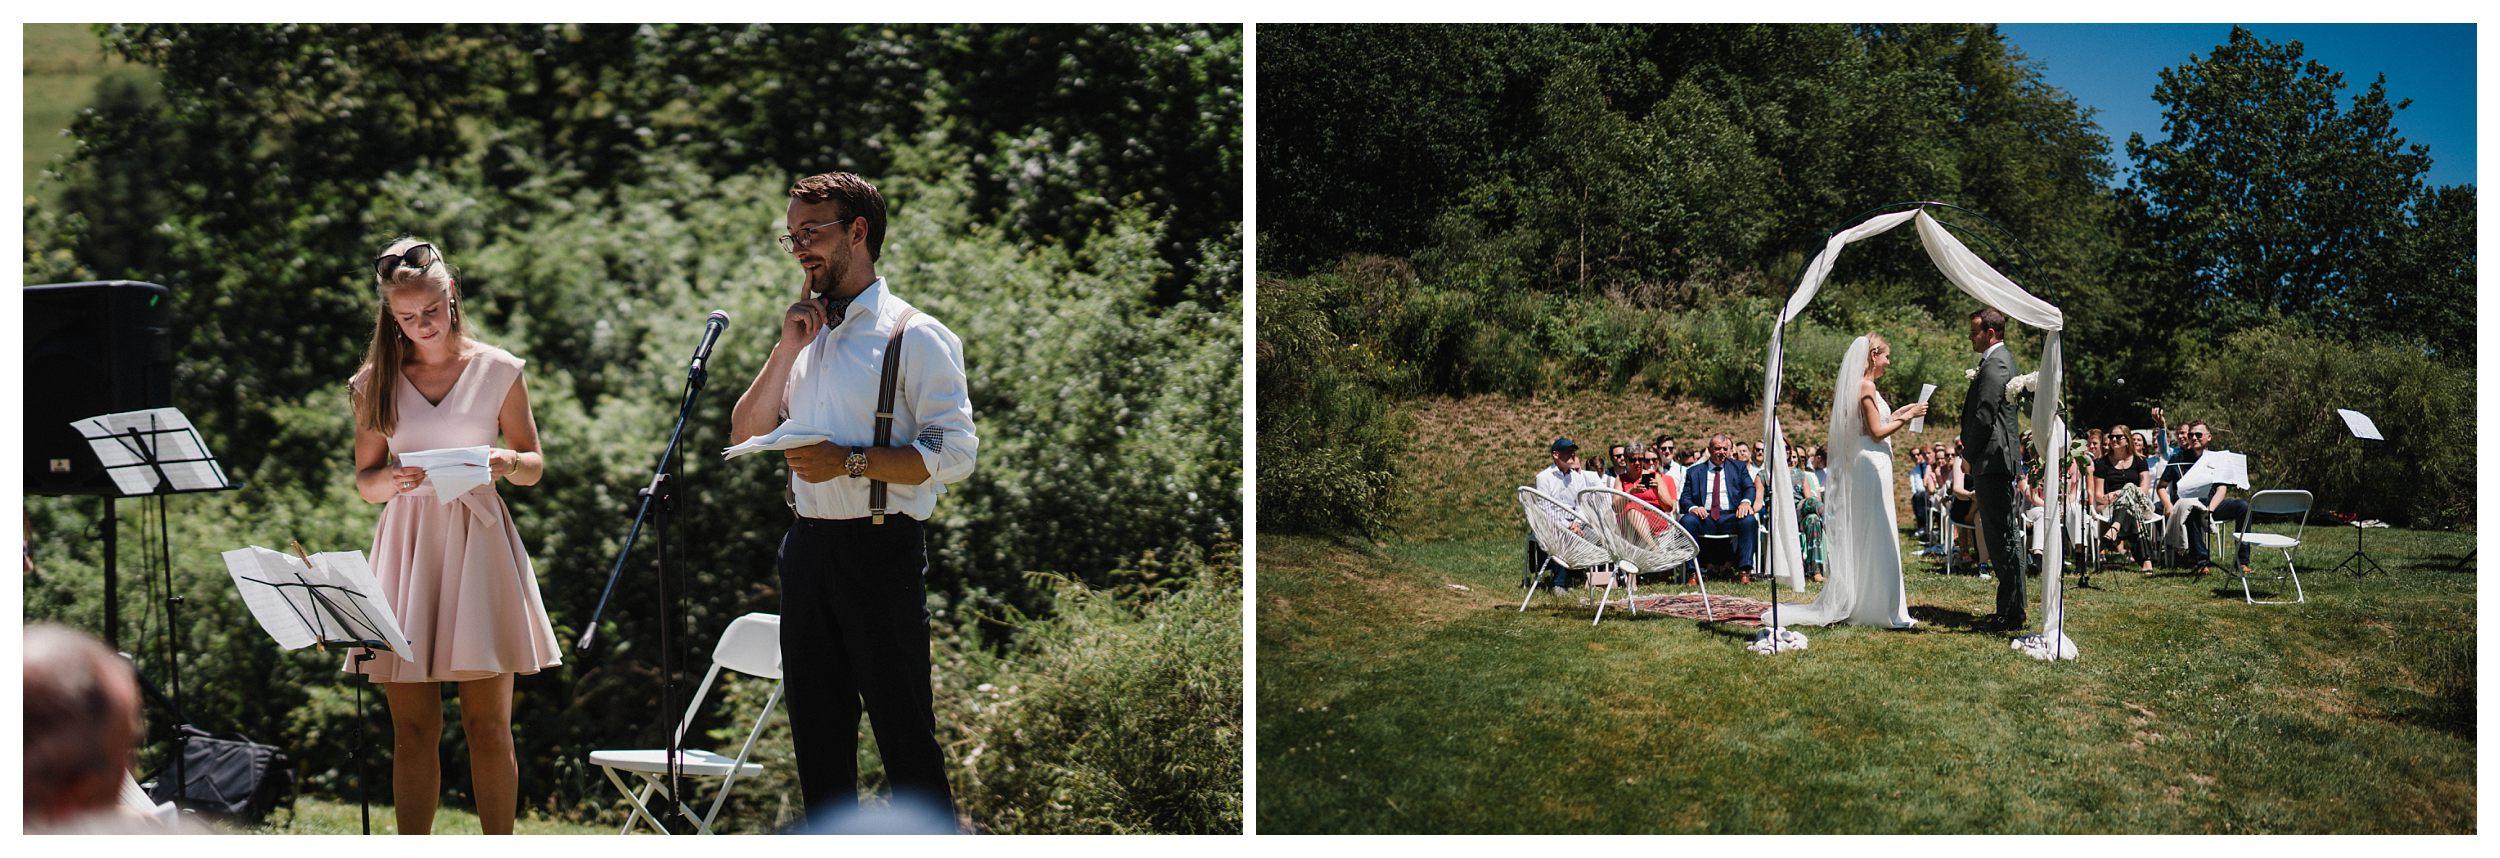 huwelijksfotograaf bruidsfotograaf destinationwedding huwelijksfotografie in ardennen nederland (66).jpg